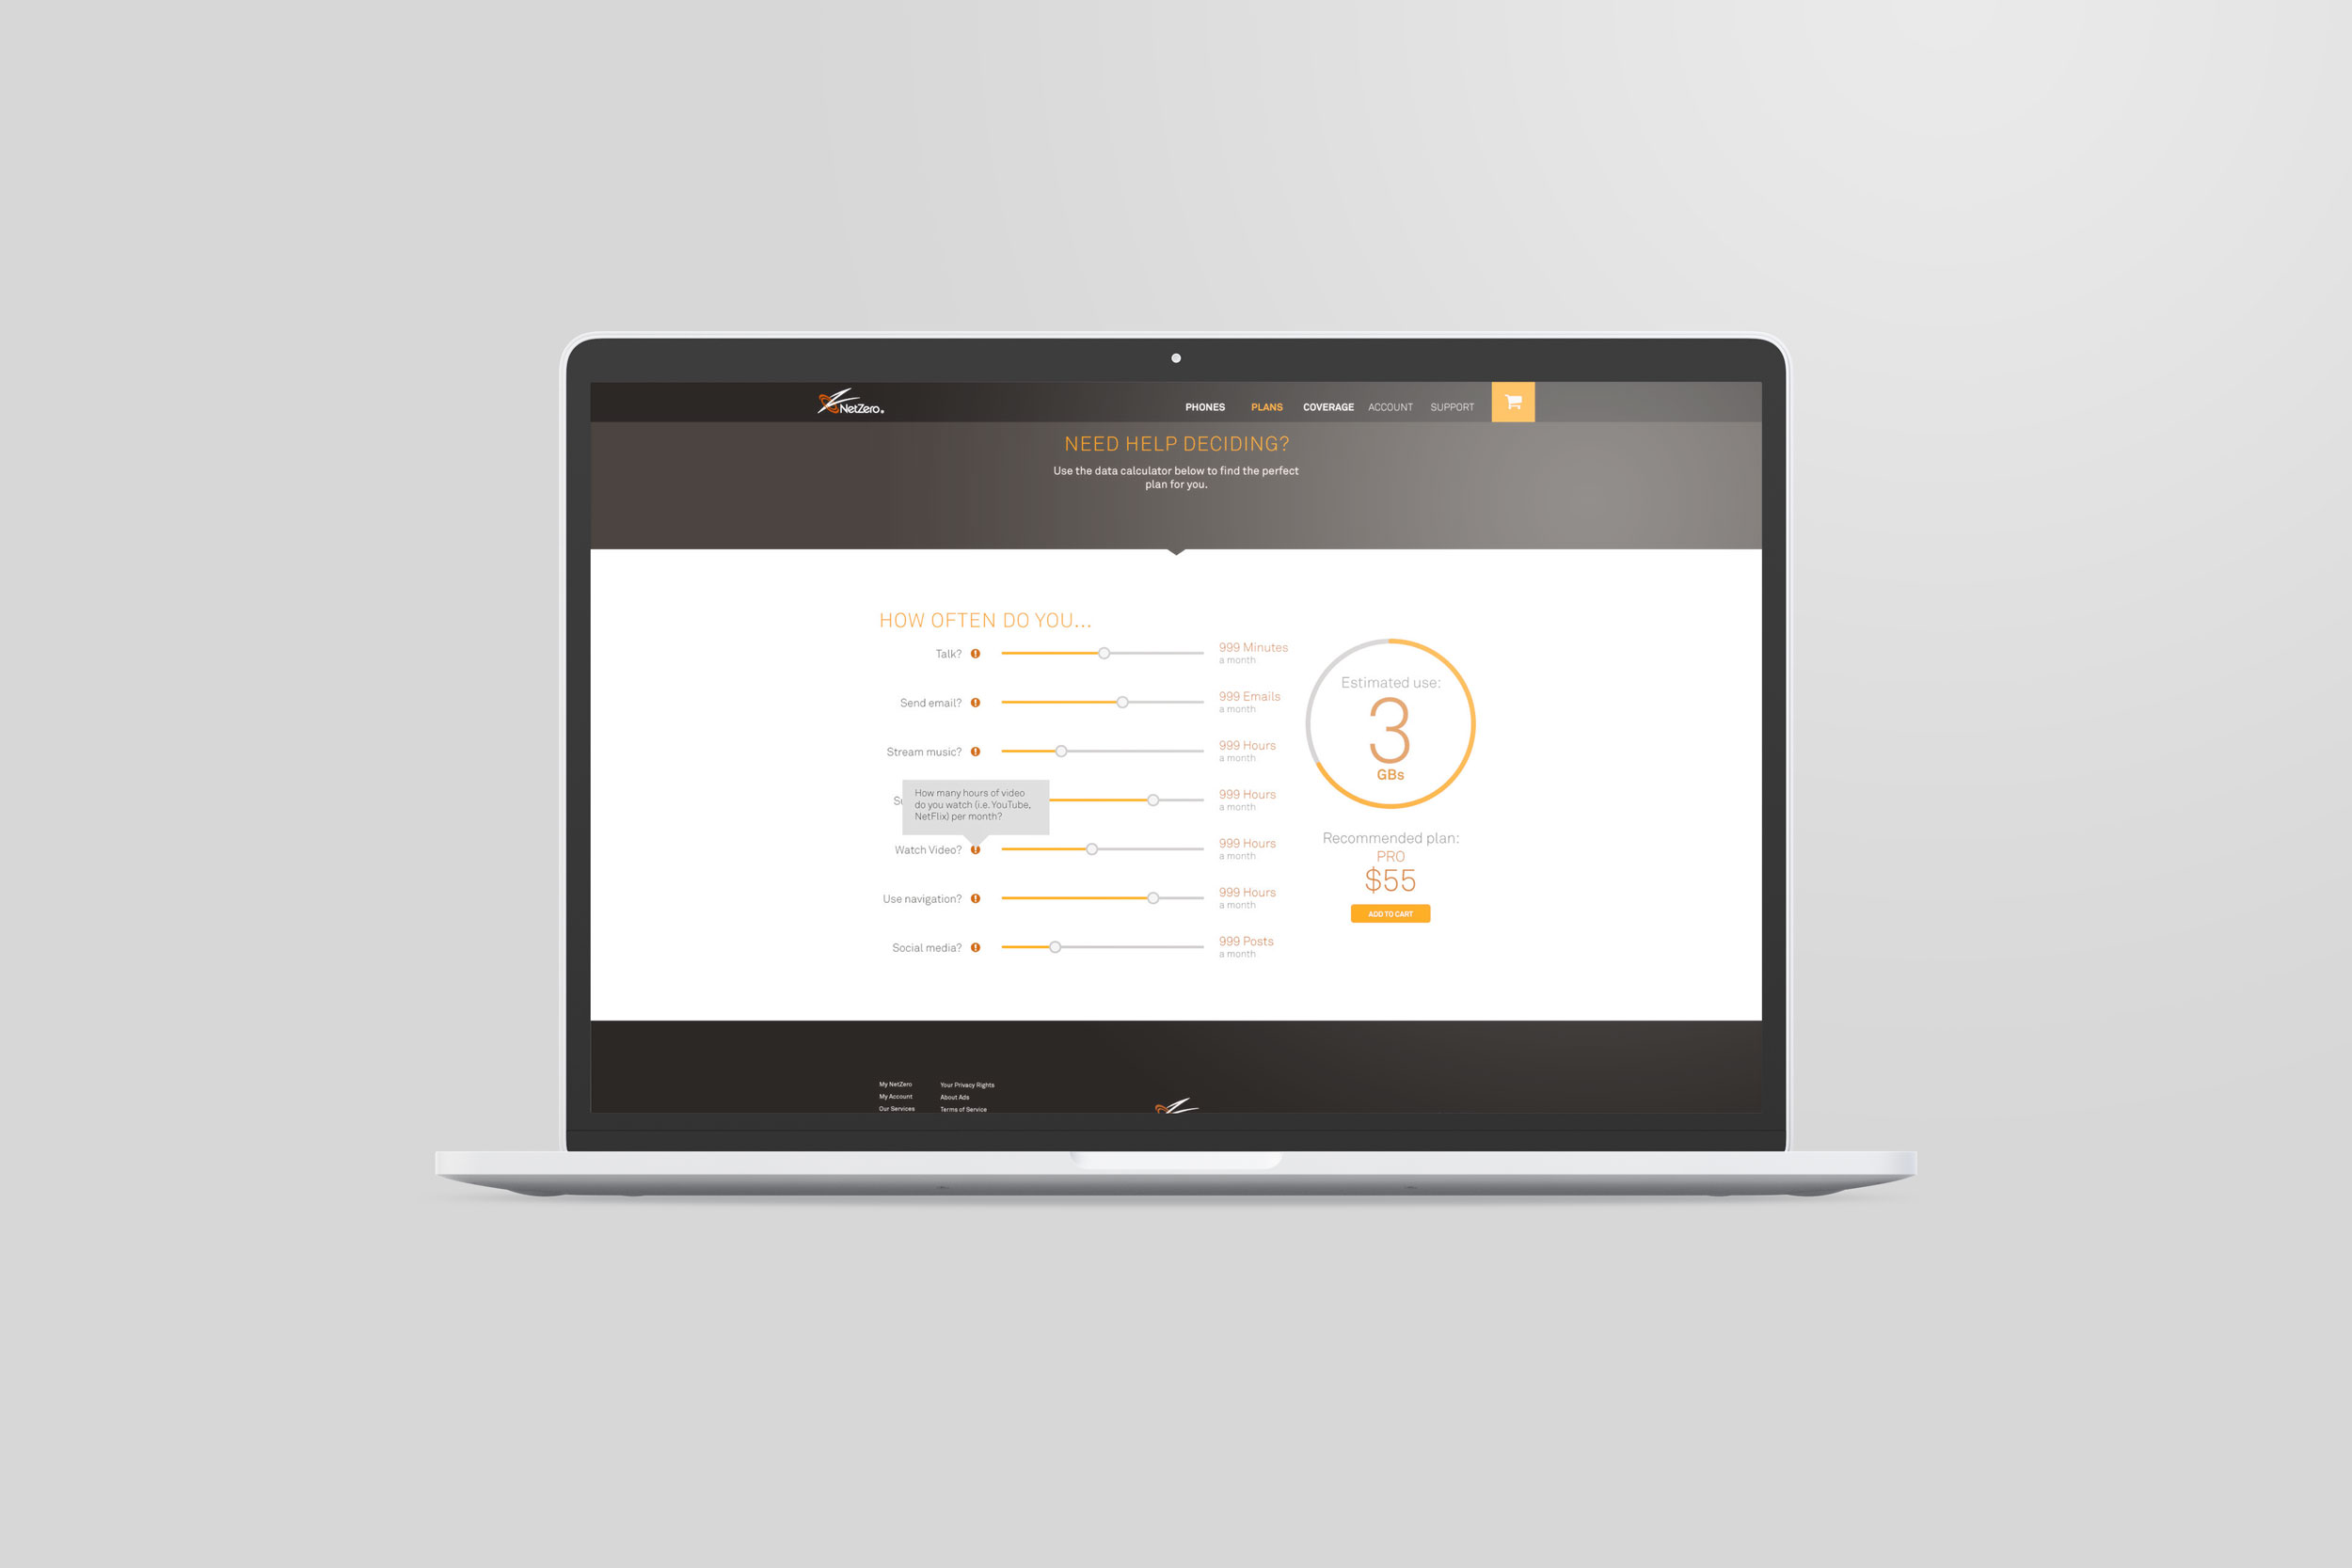 Laptop with NetZero site page